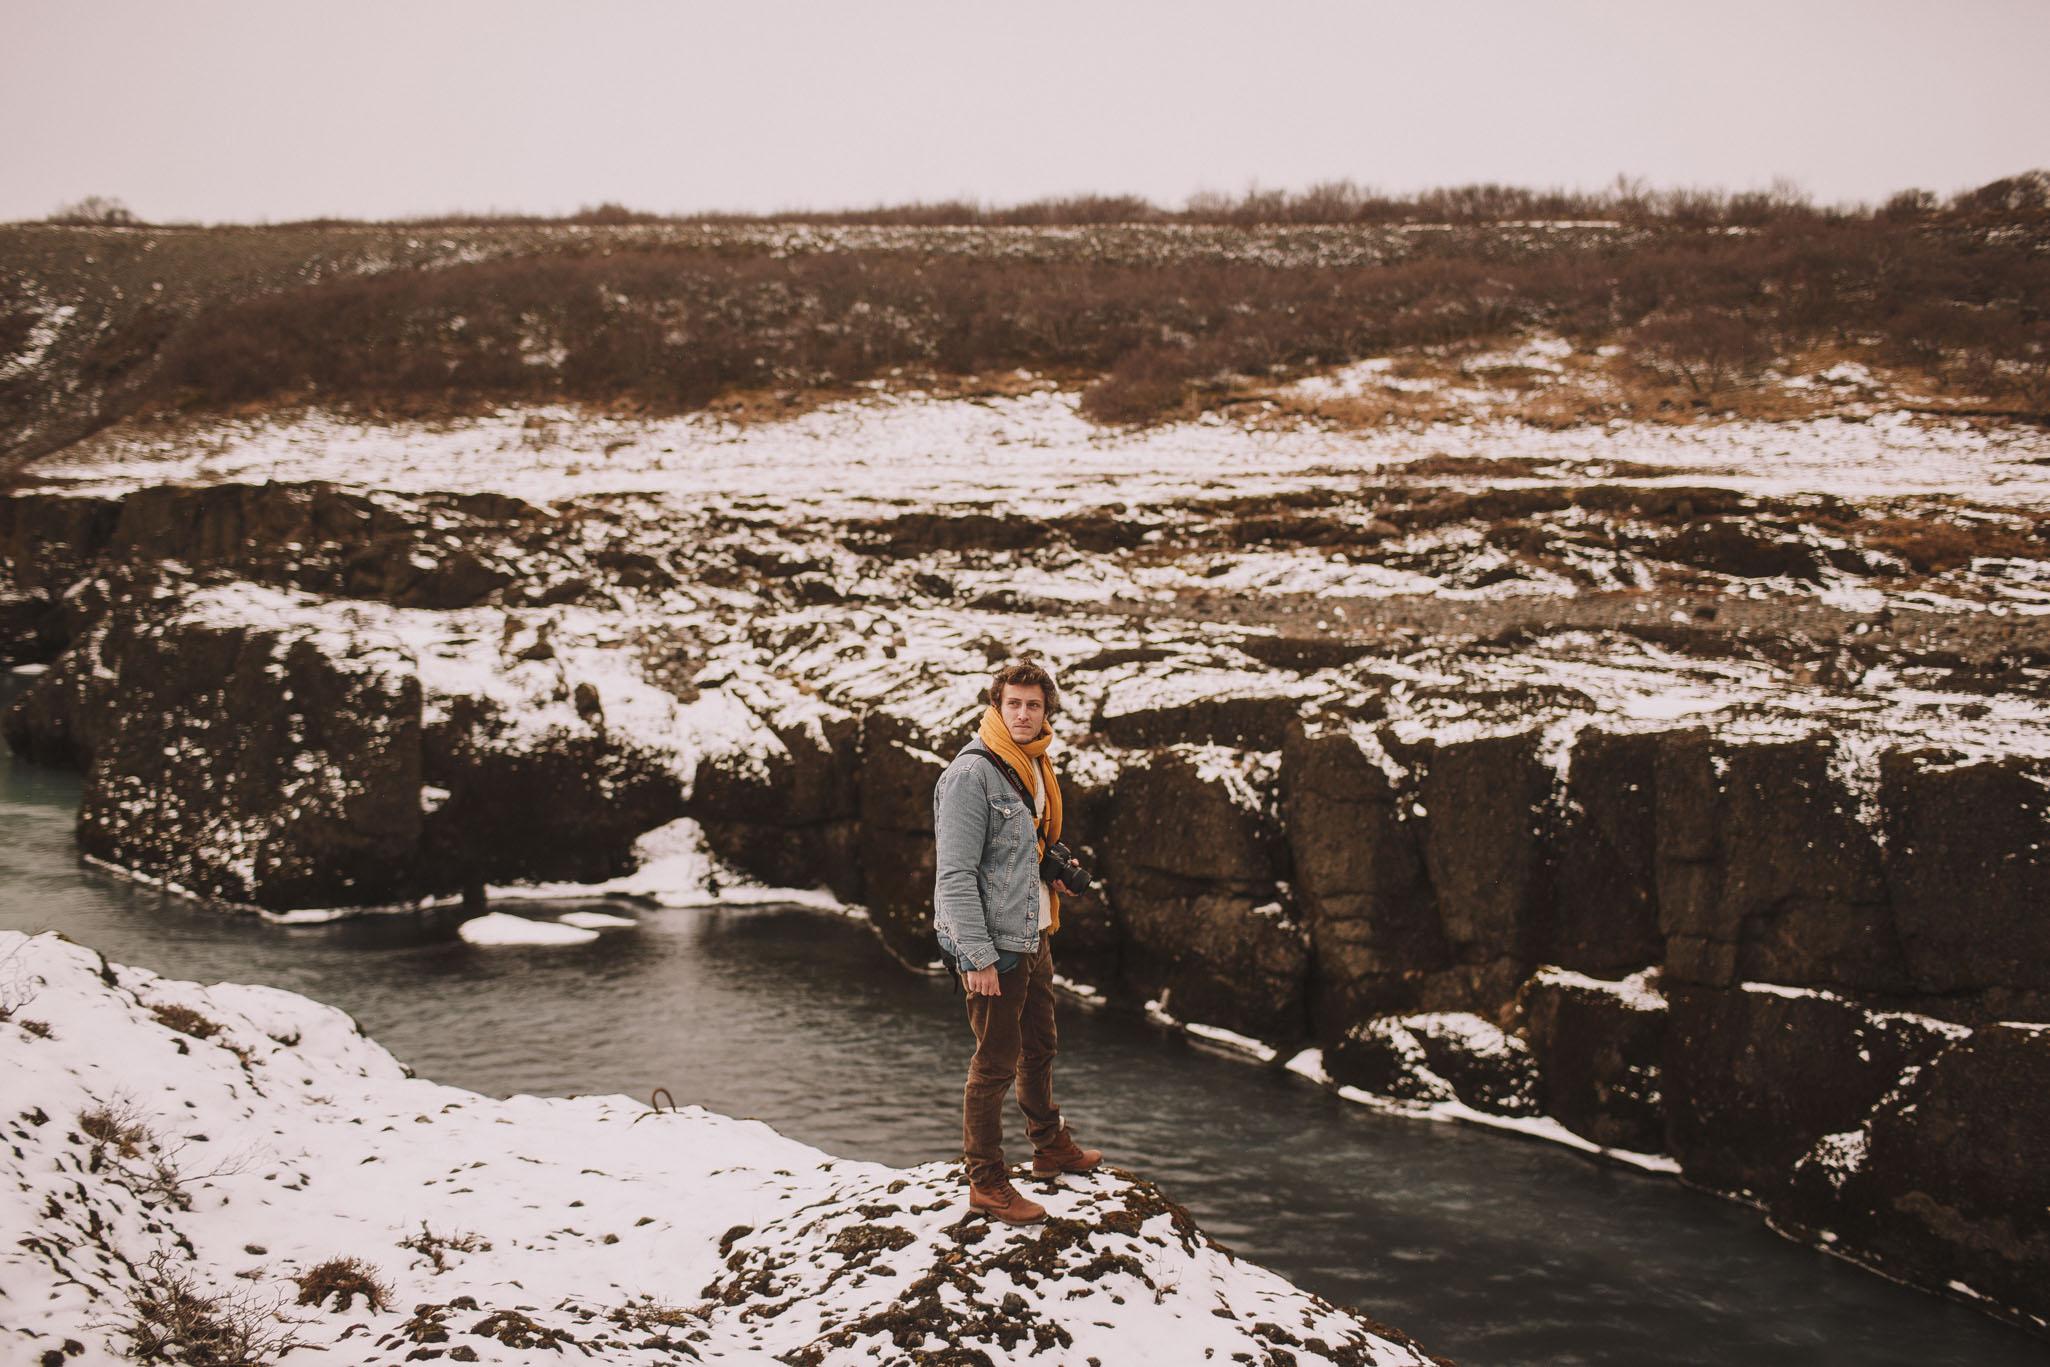 Road-trip-Islande-Iceland-Voyage-Travel-Portrait-Jérémy-Boyer-Geysir-Geysers-Horse-snow-ice-Gullfoss-15.jpg